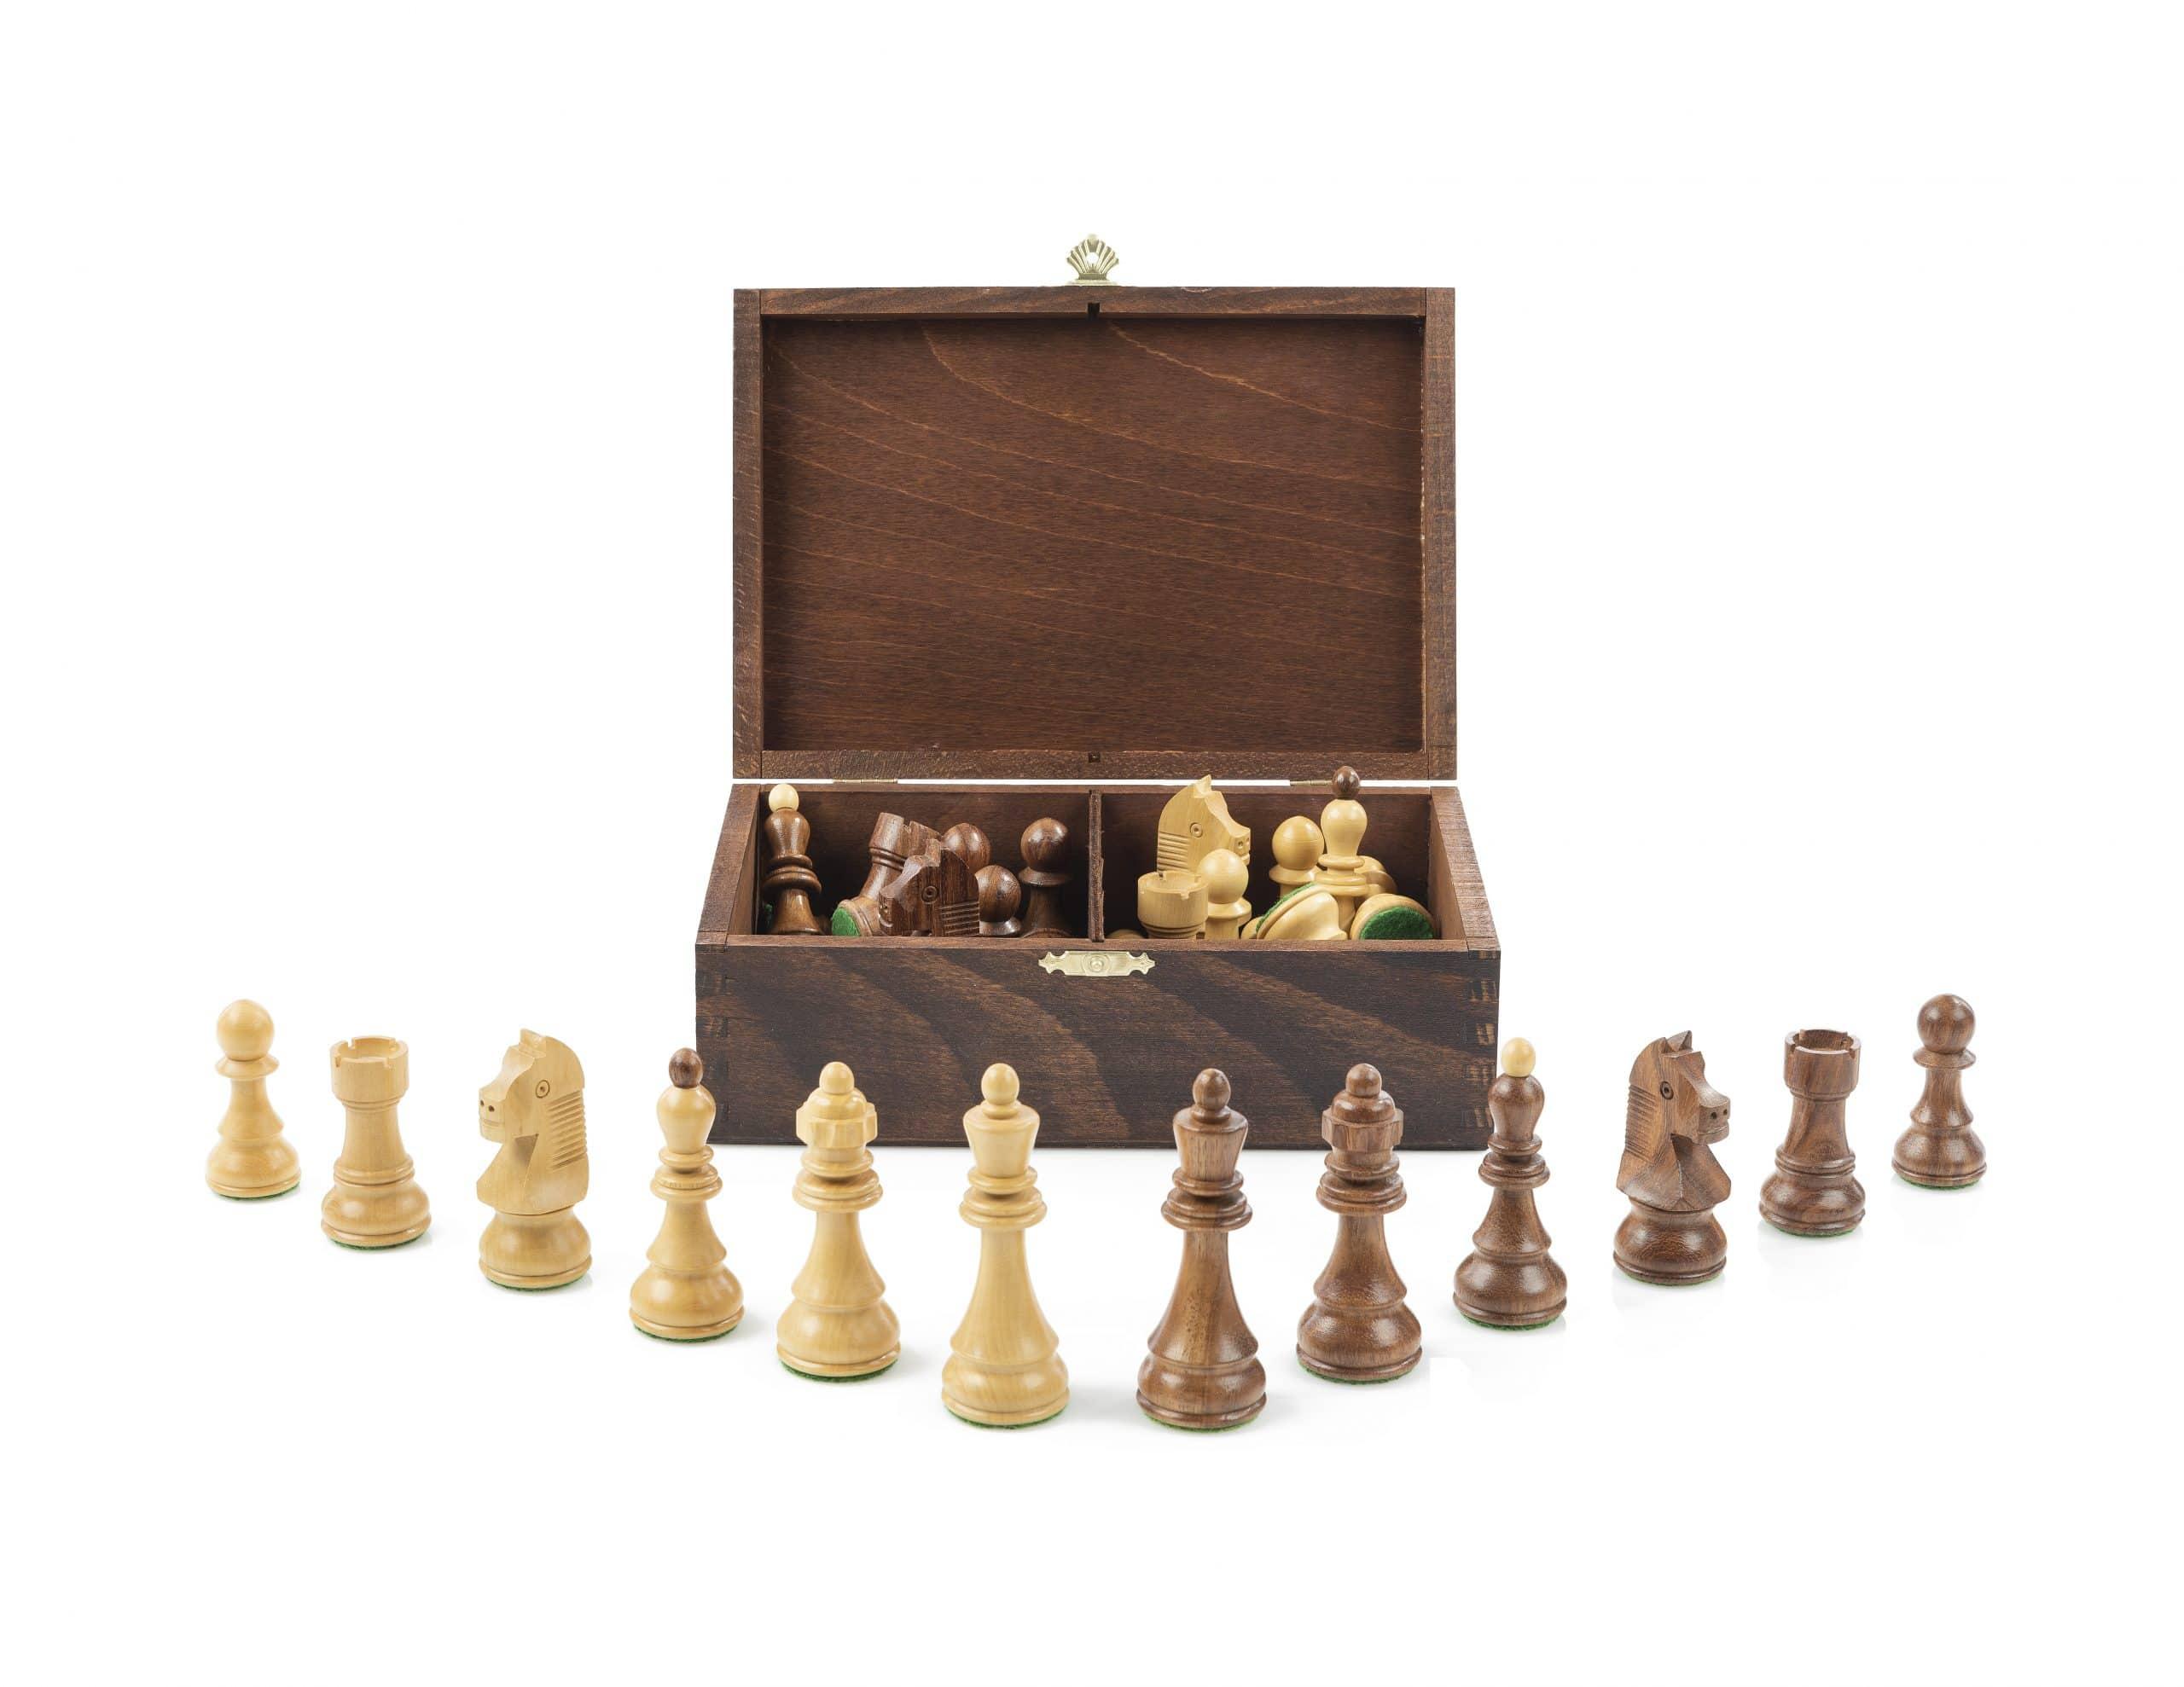 Holzkiste Schachfiguren